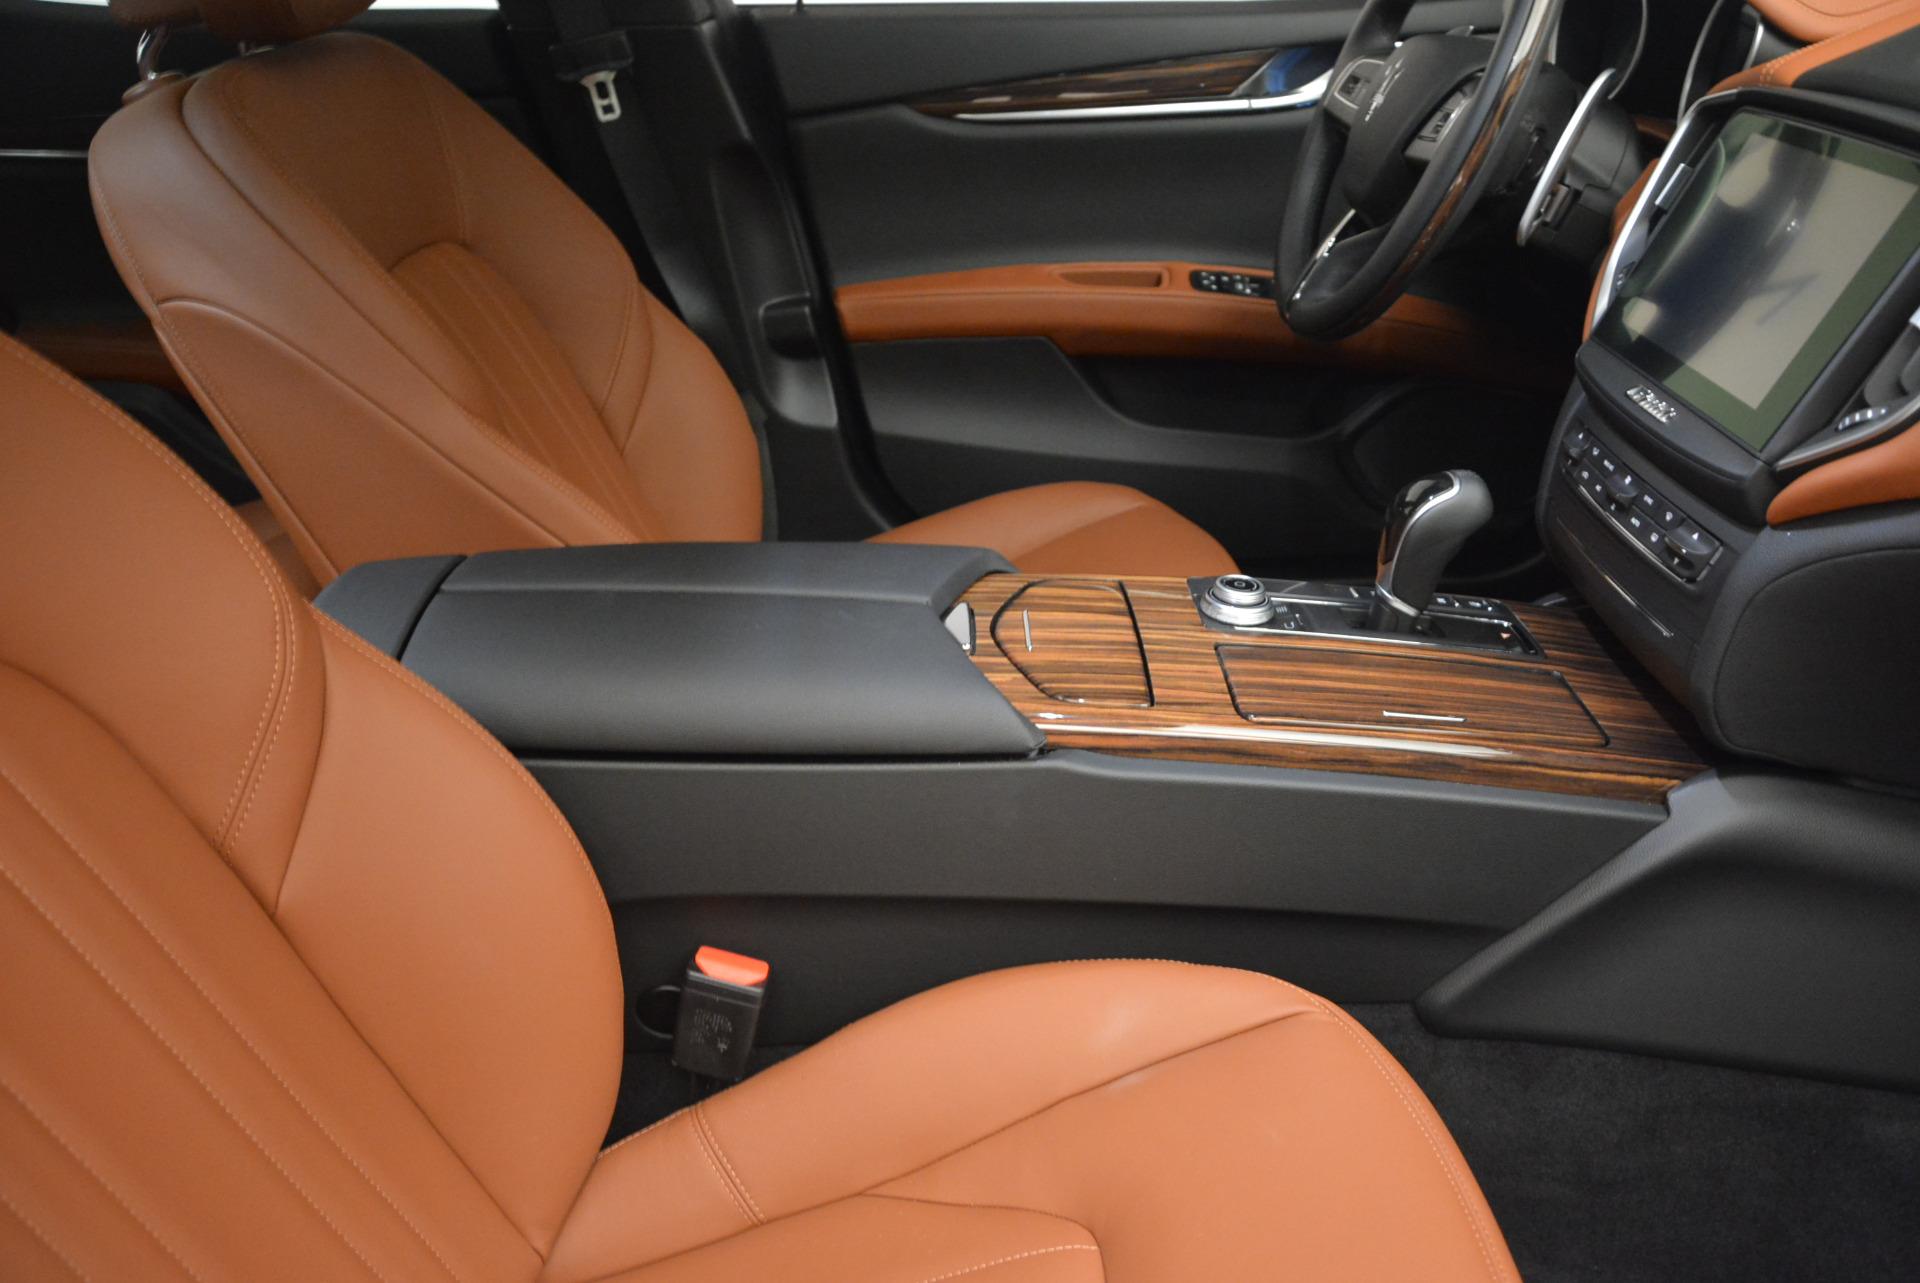 Used 2017 Maserati Ghibli S Q4  EX-LOANER For Sale In Greenwich, CT. Alfa Romeo of Greenwich, W311 565_p20